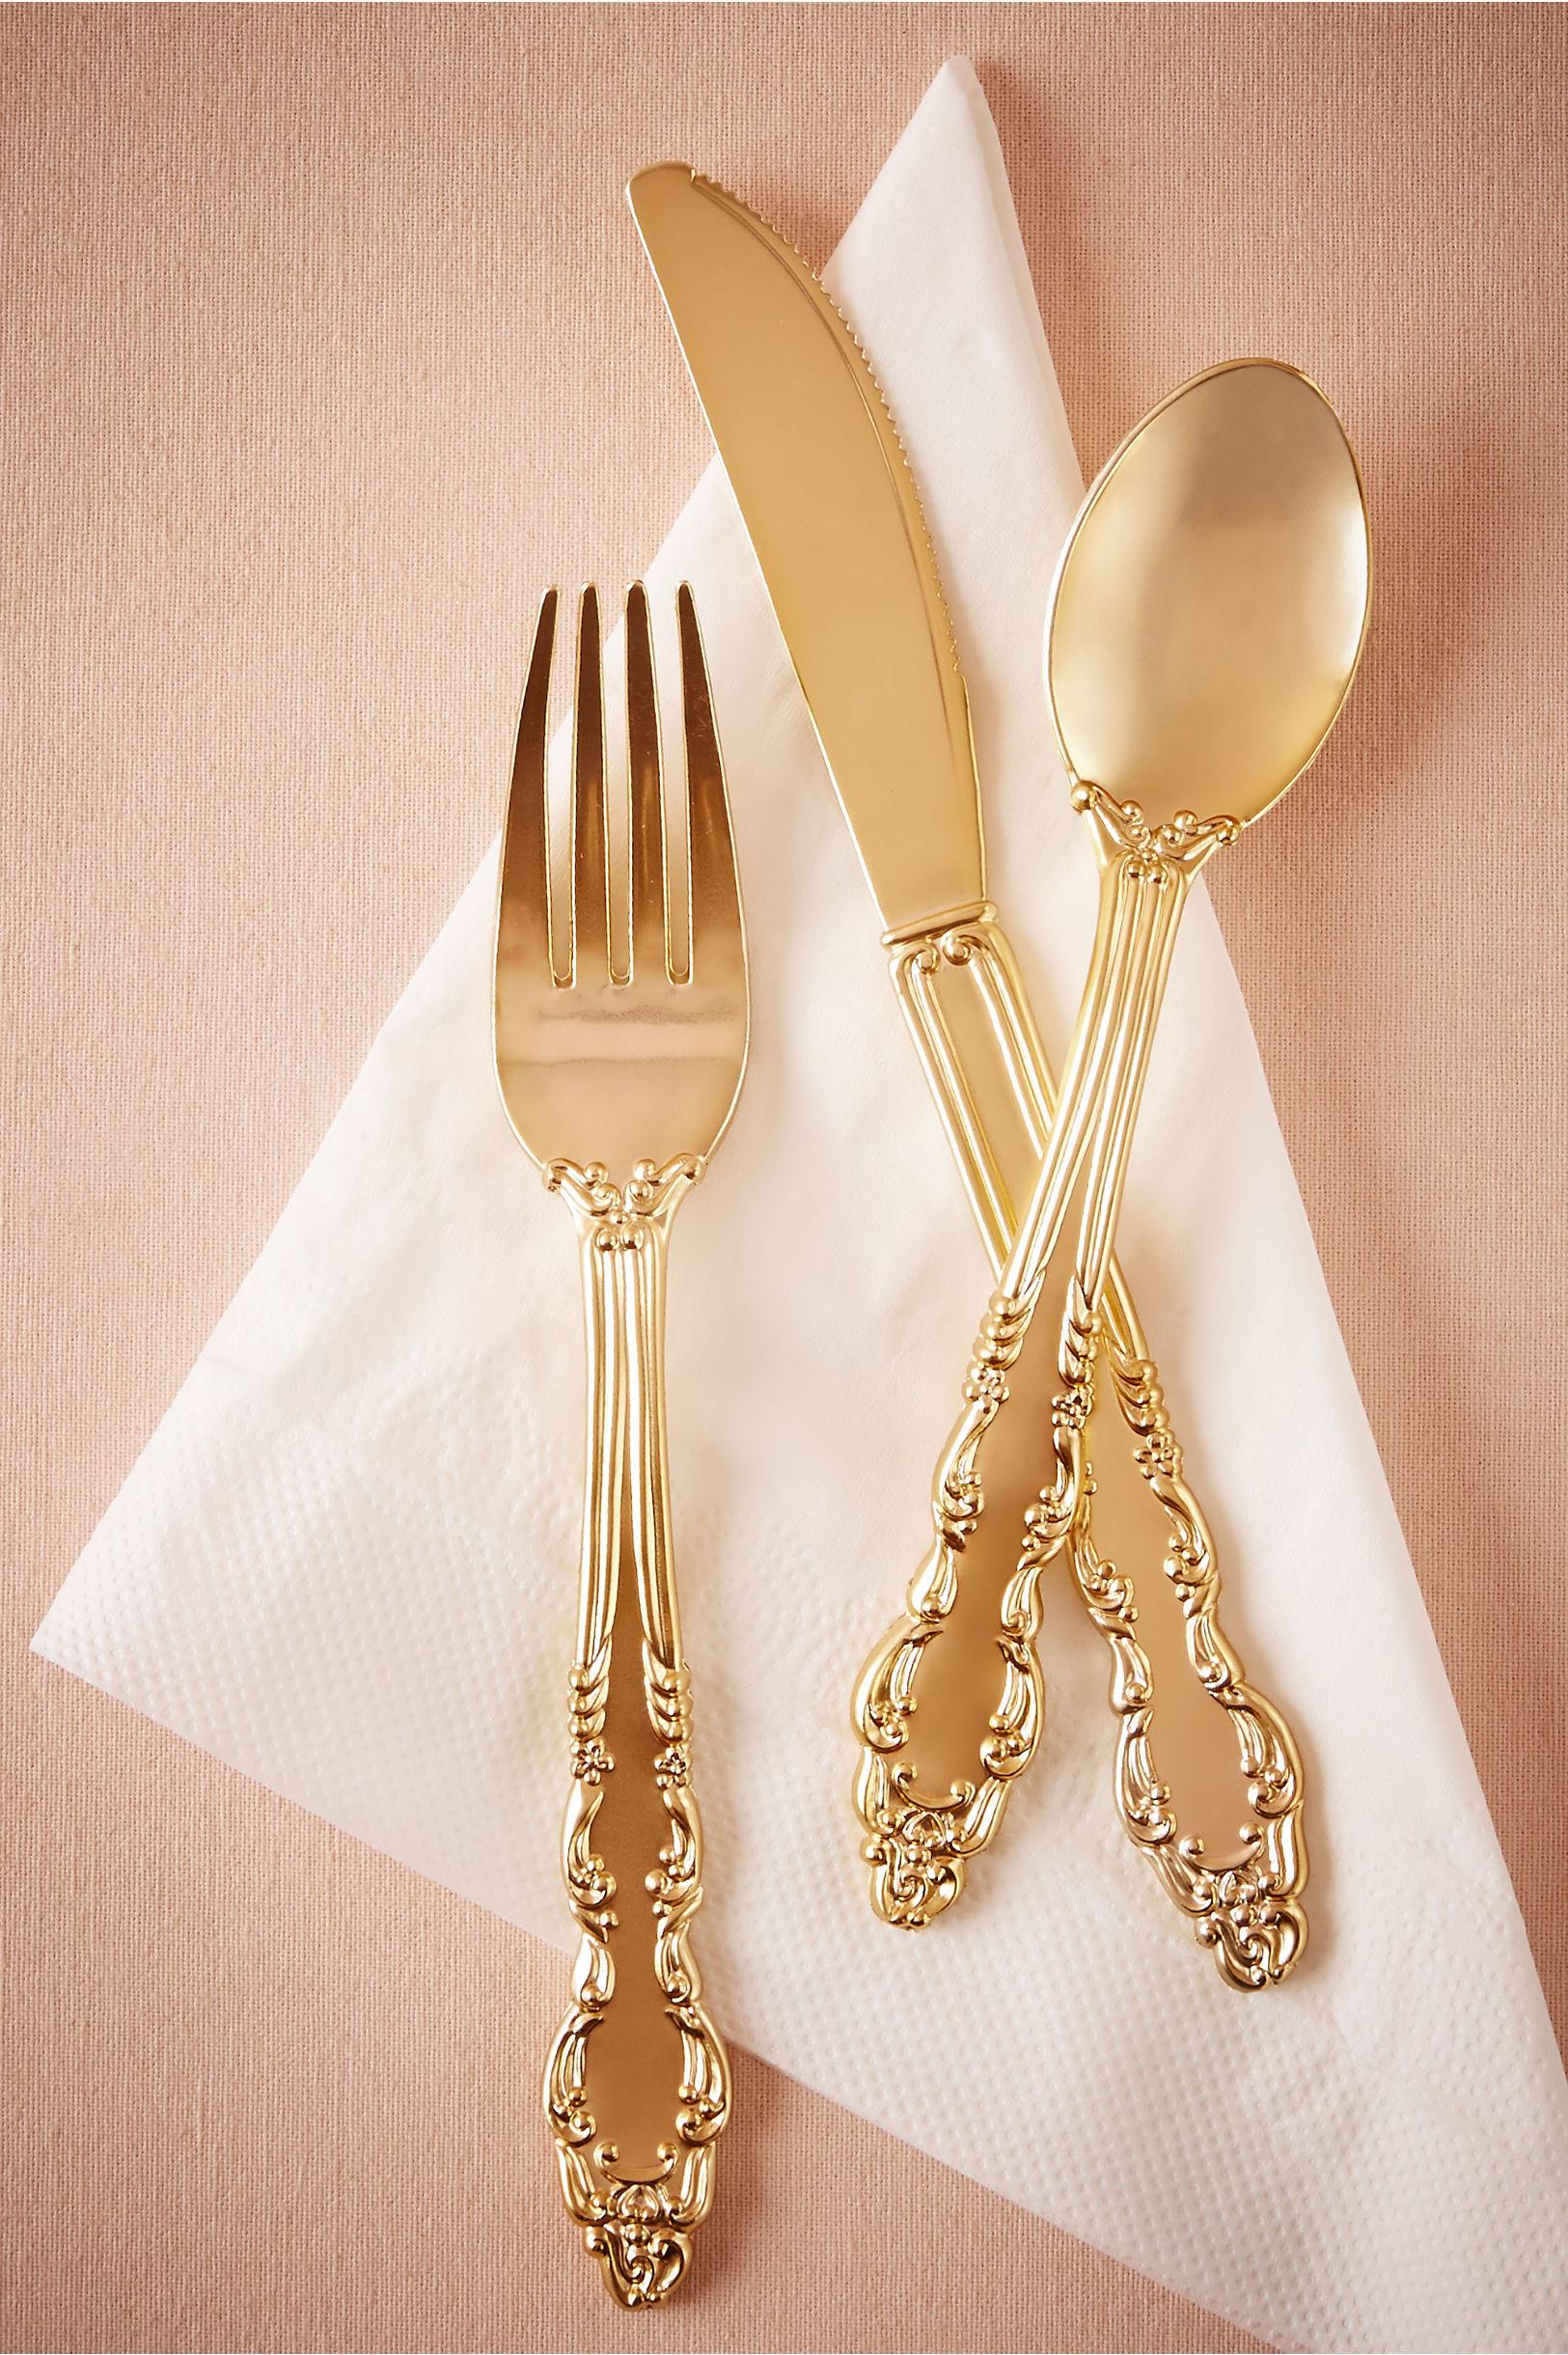 Cheap dresses good quality utensils